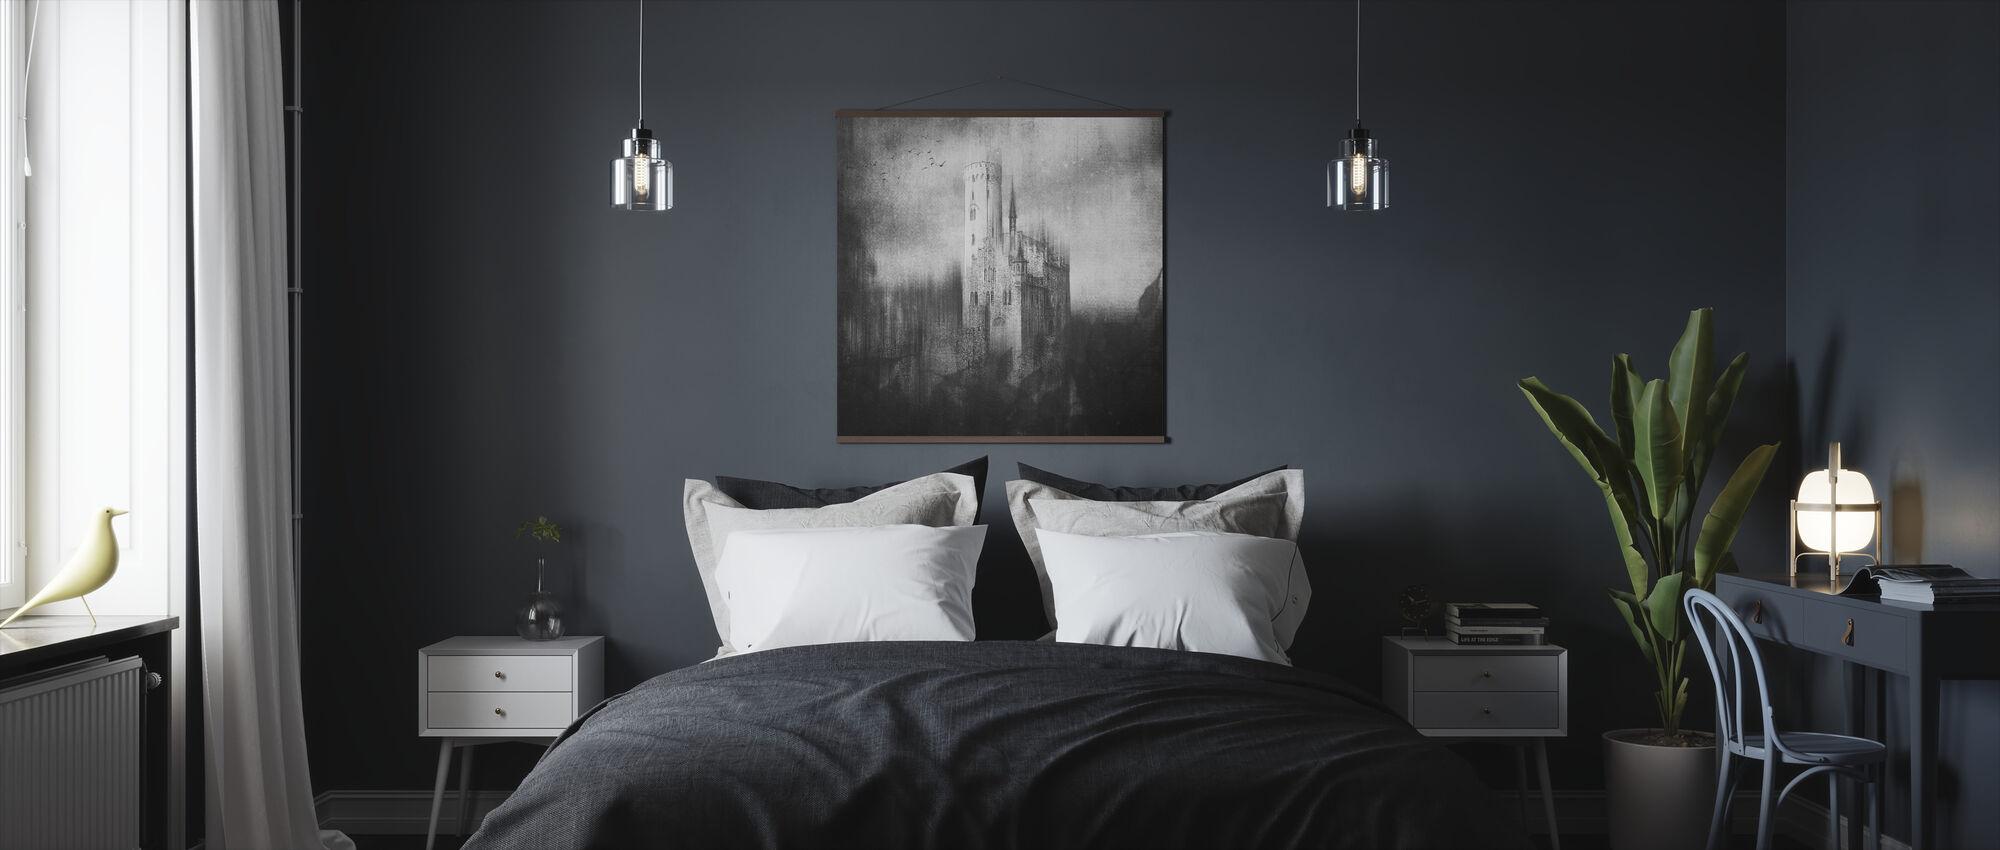 Lichtenstein Castle - Poster - Bedroom